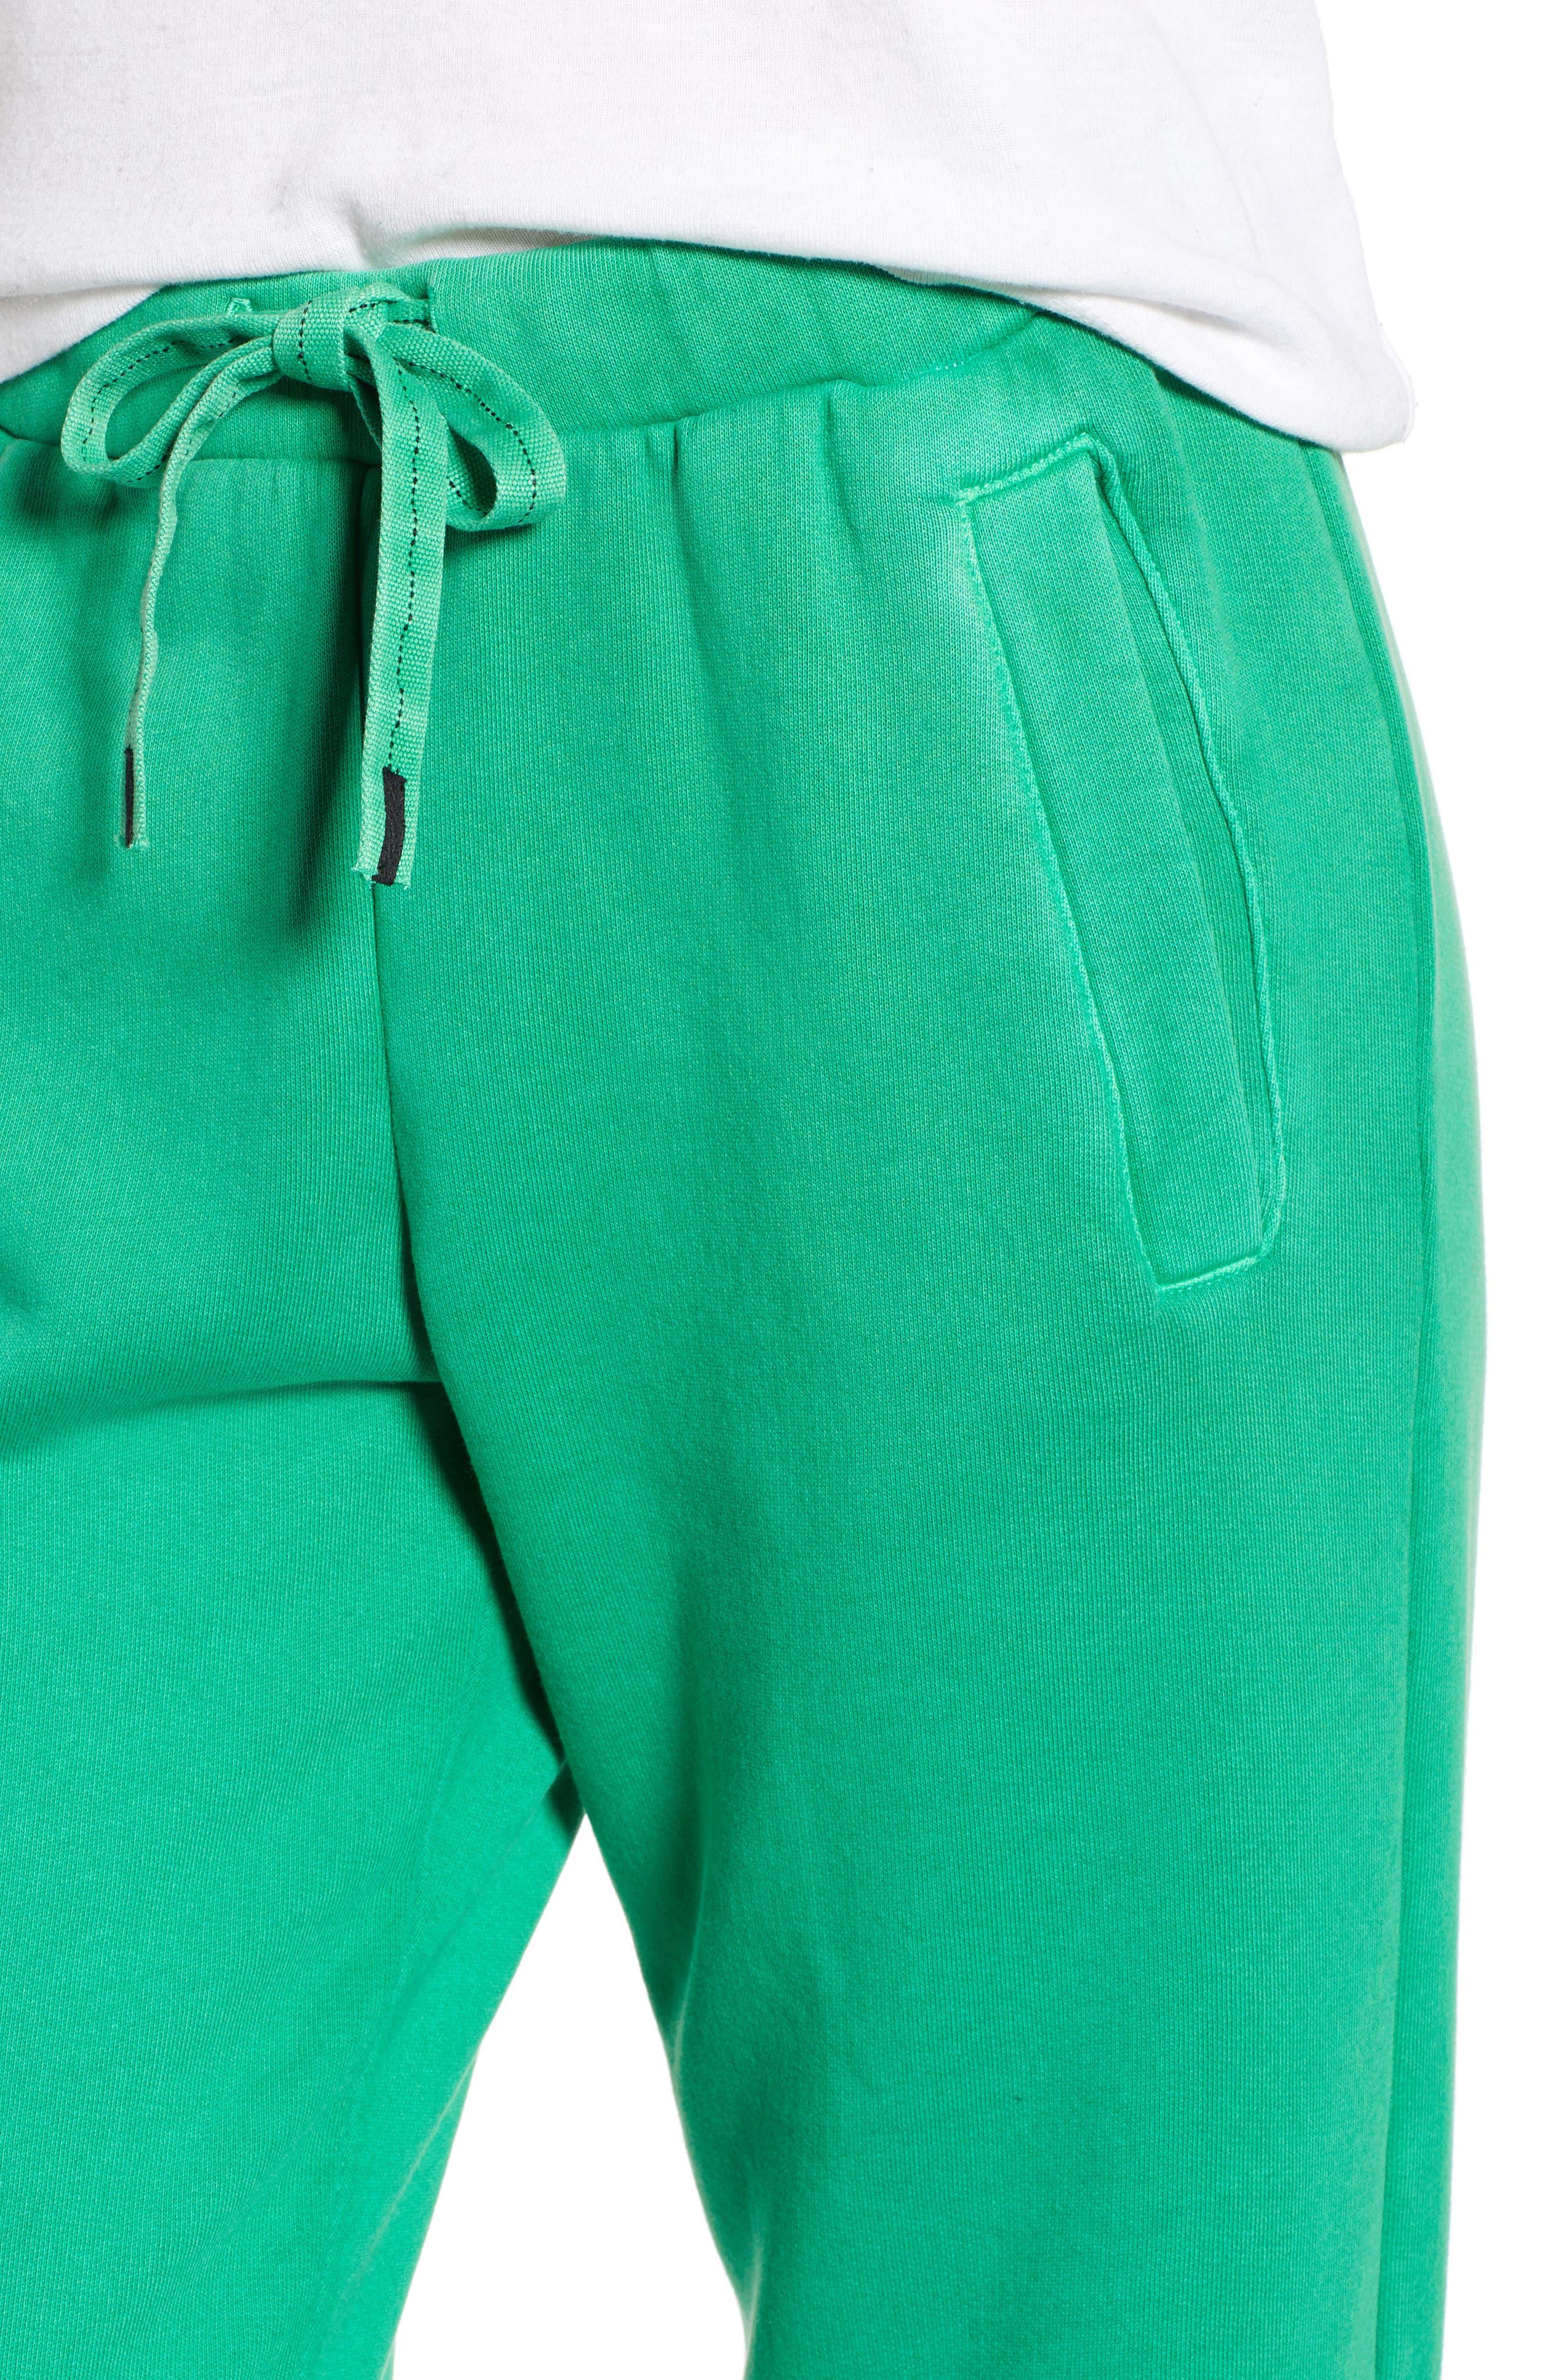 Neon Sweatpants,                             Alternate thumbnail 4, color,                             GREEN